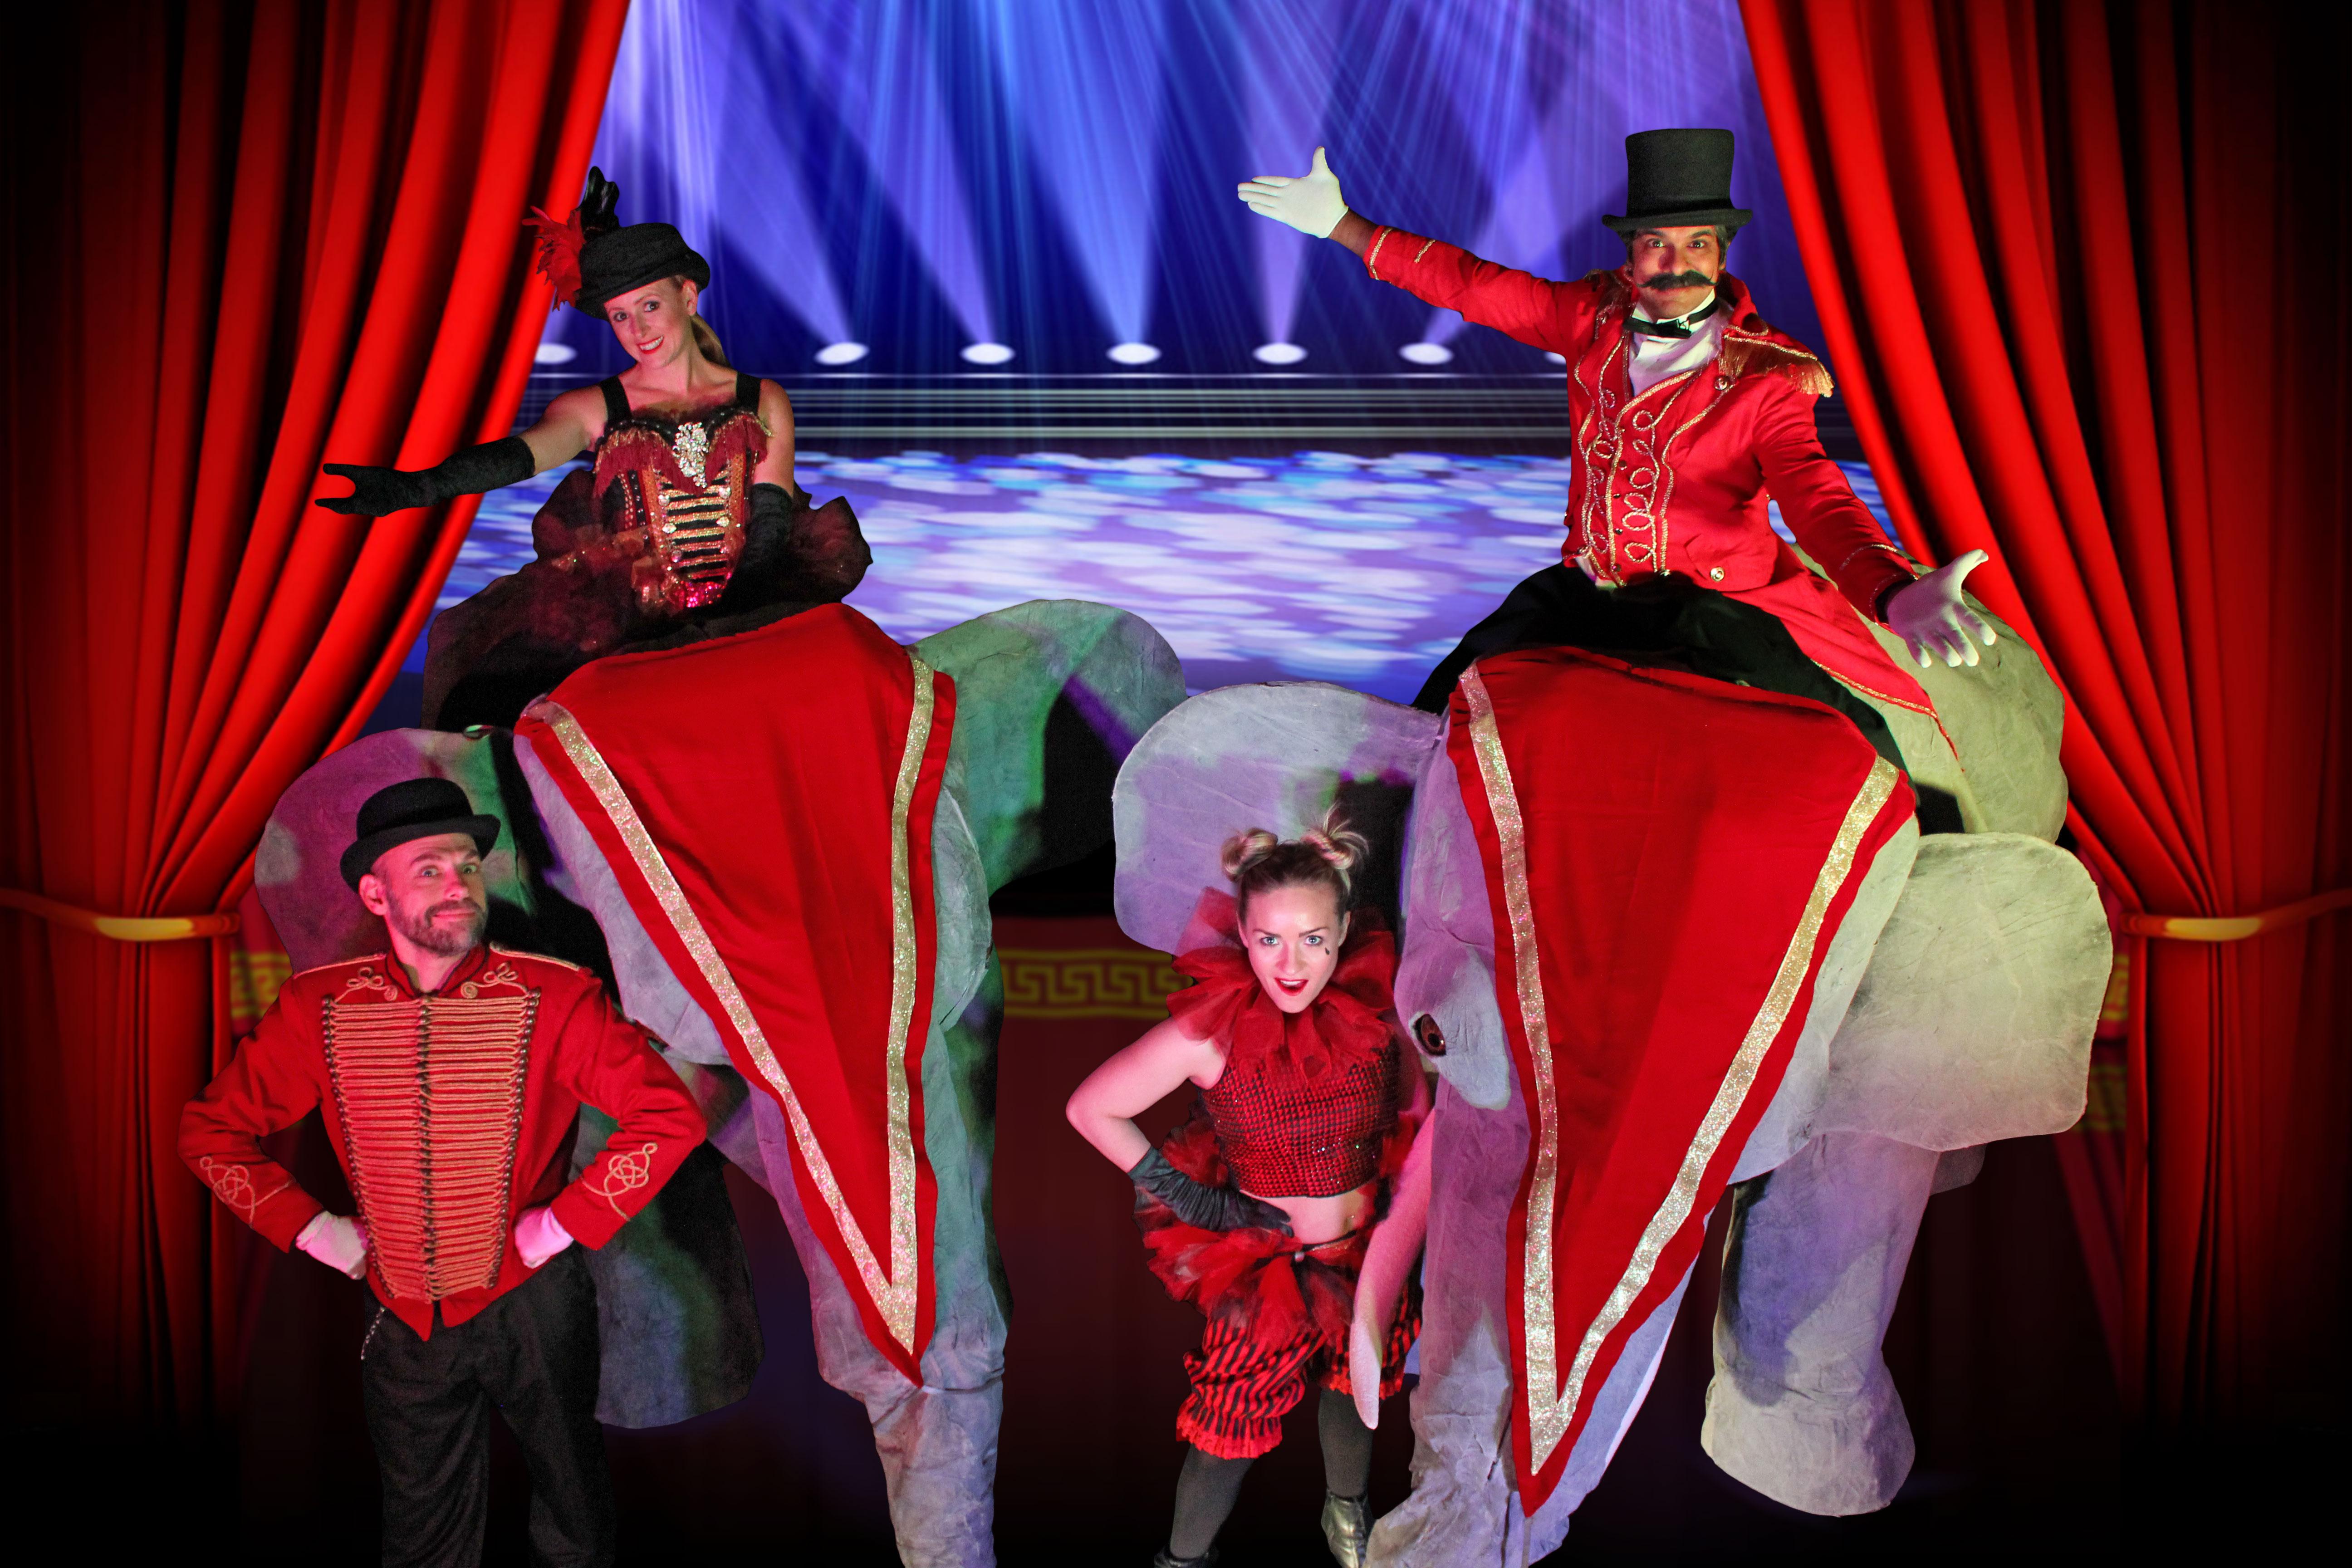 Circus theme elephants IMG_5049_Web-Size